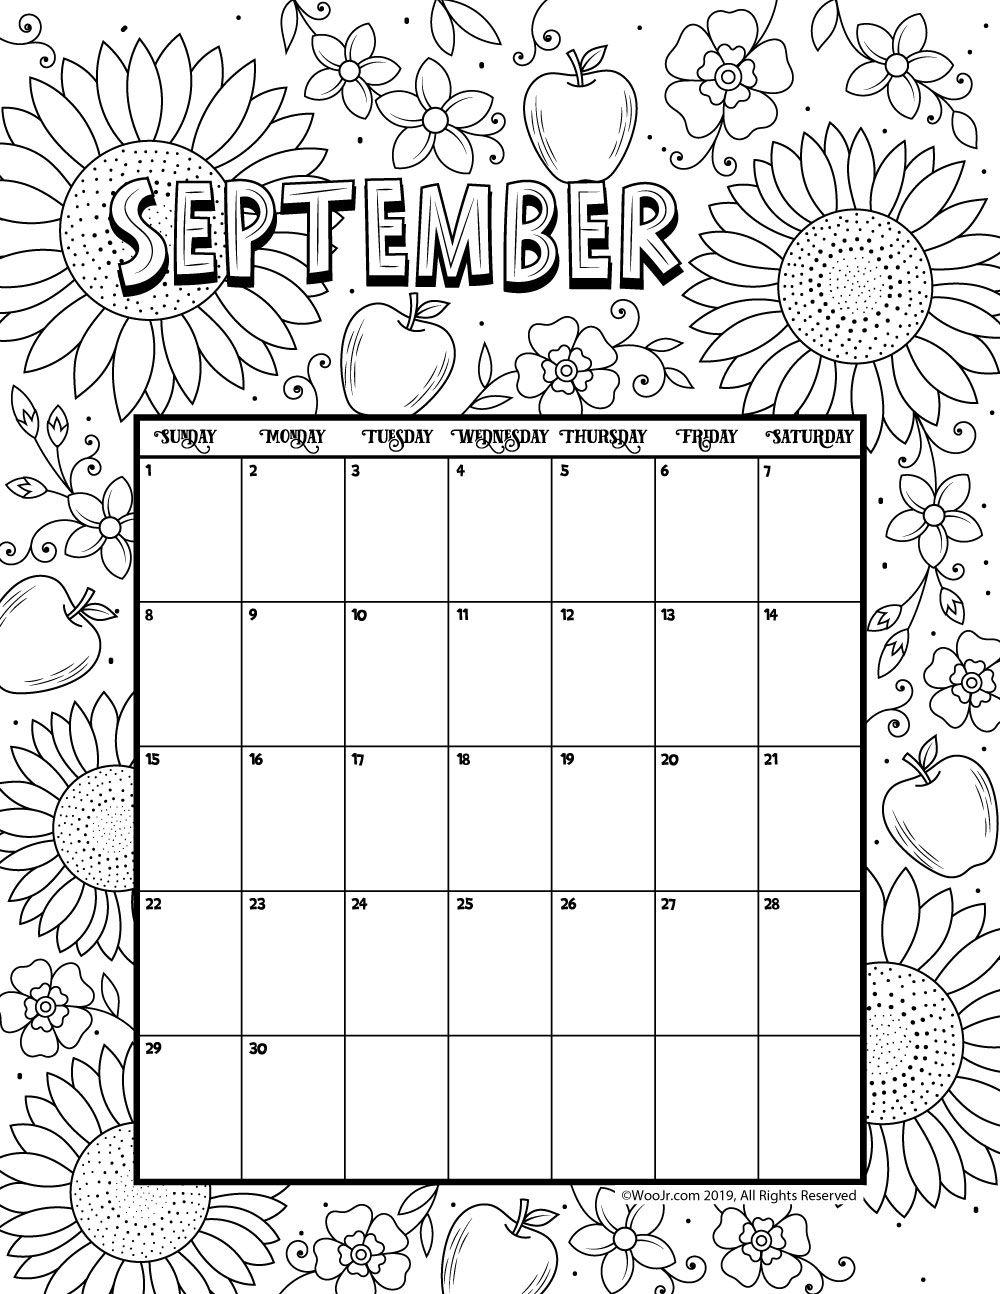 September 2019 Coloring Calendar | Printable Calendar Pages